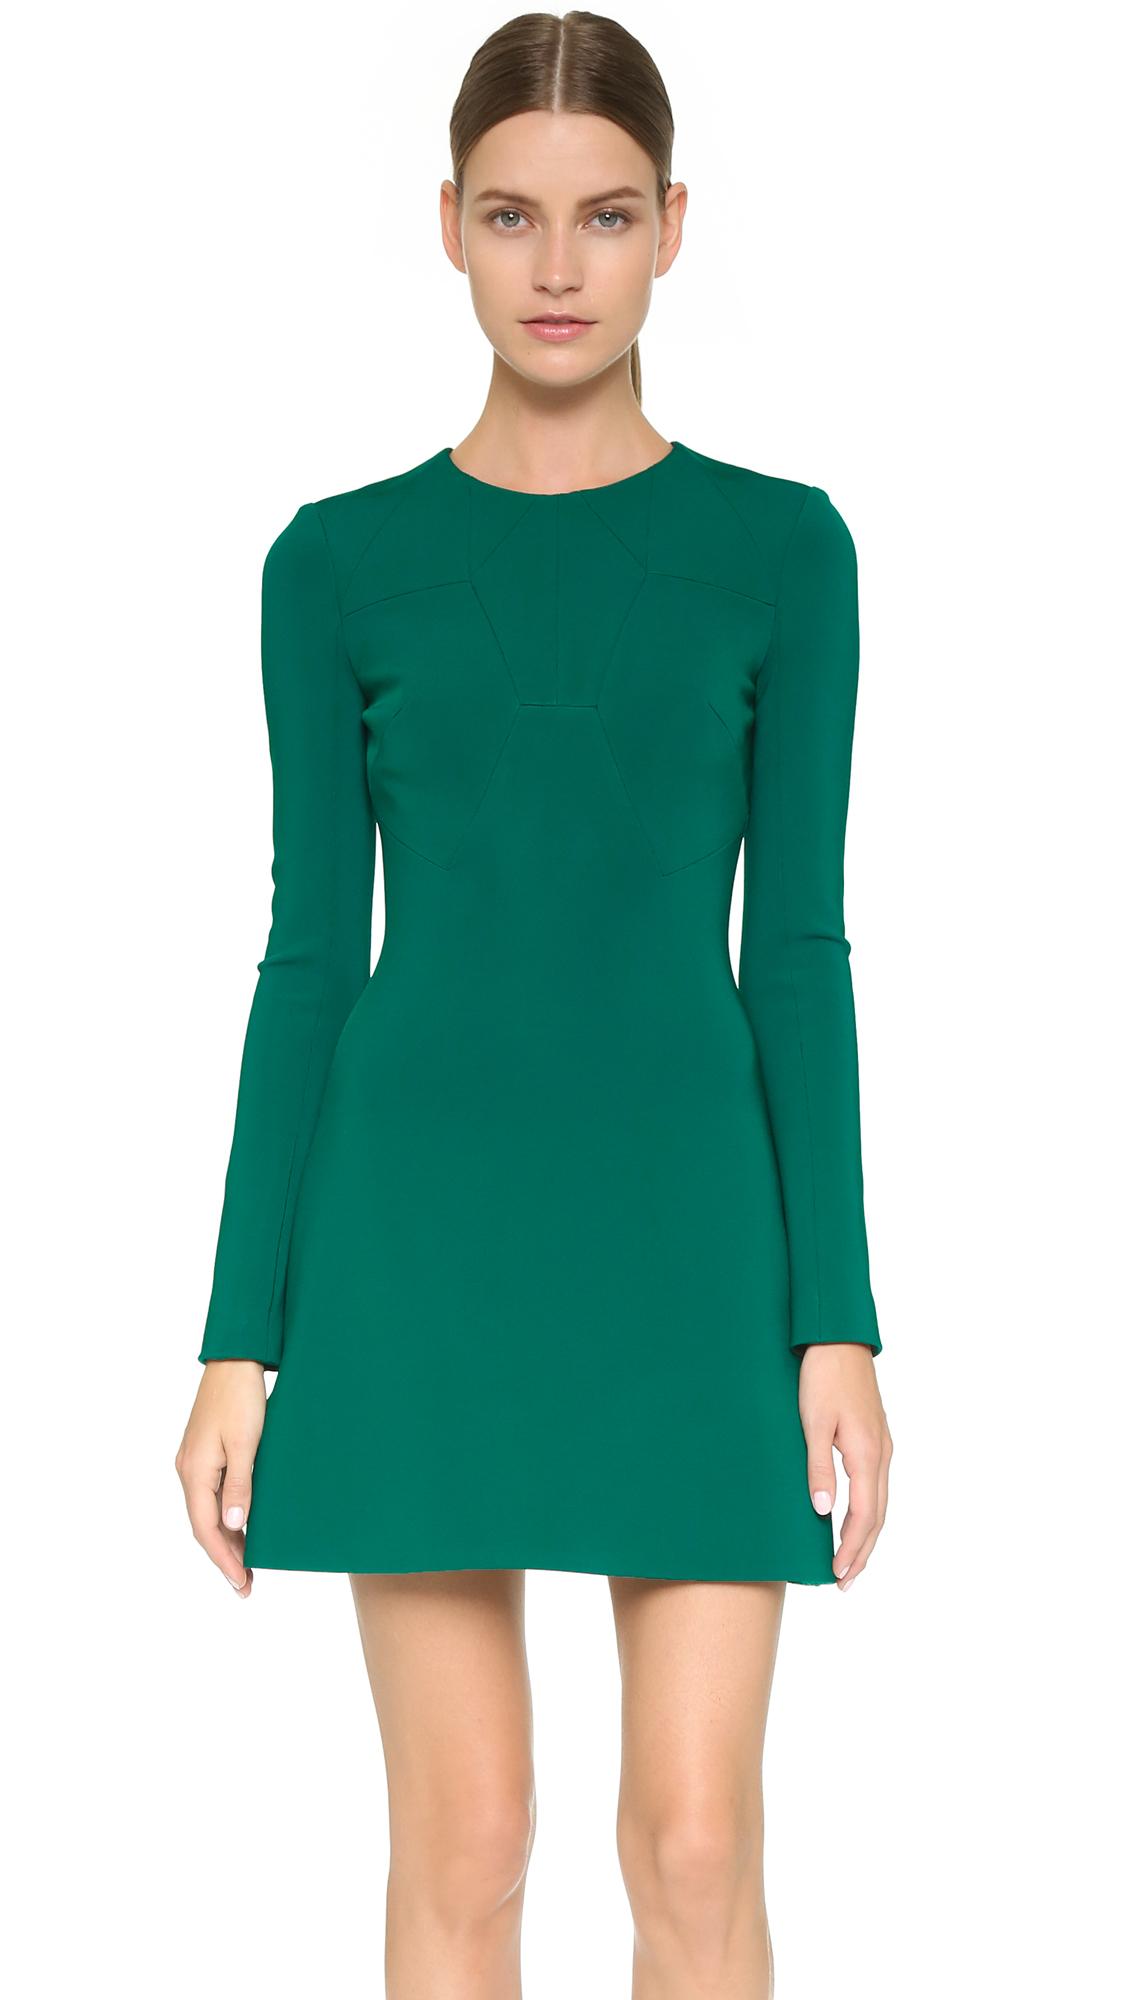 Cushnie et ochs Long Sleeve Dress - Emerald in Green | Lyst